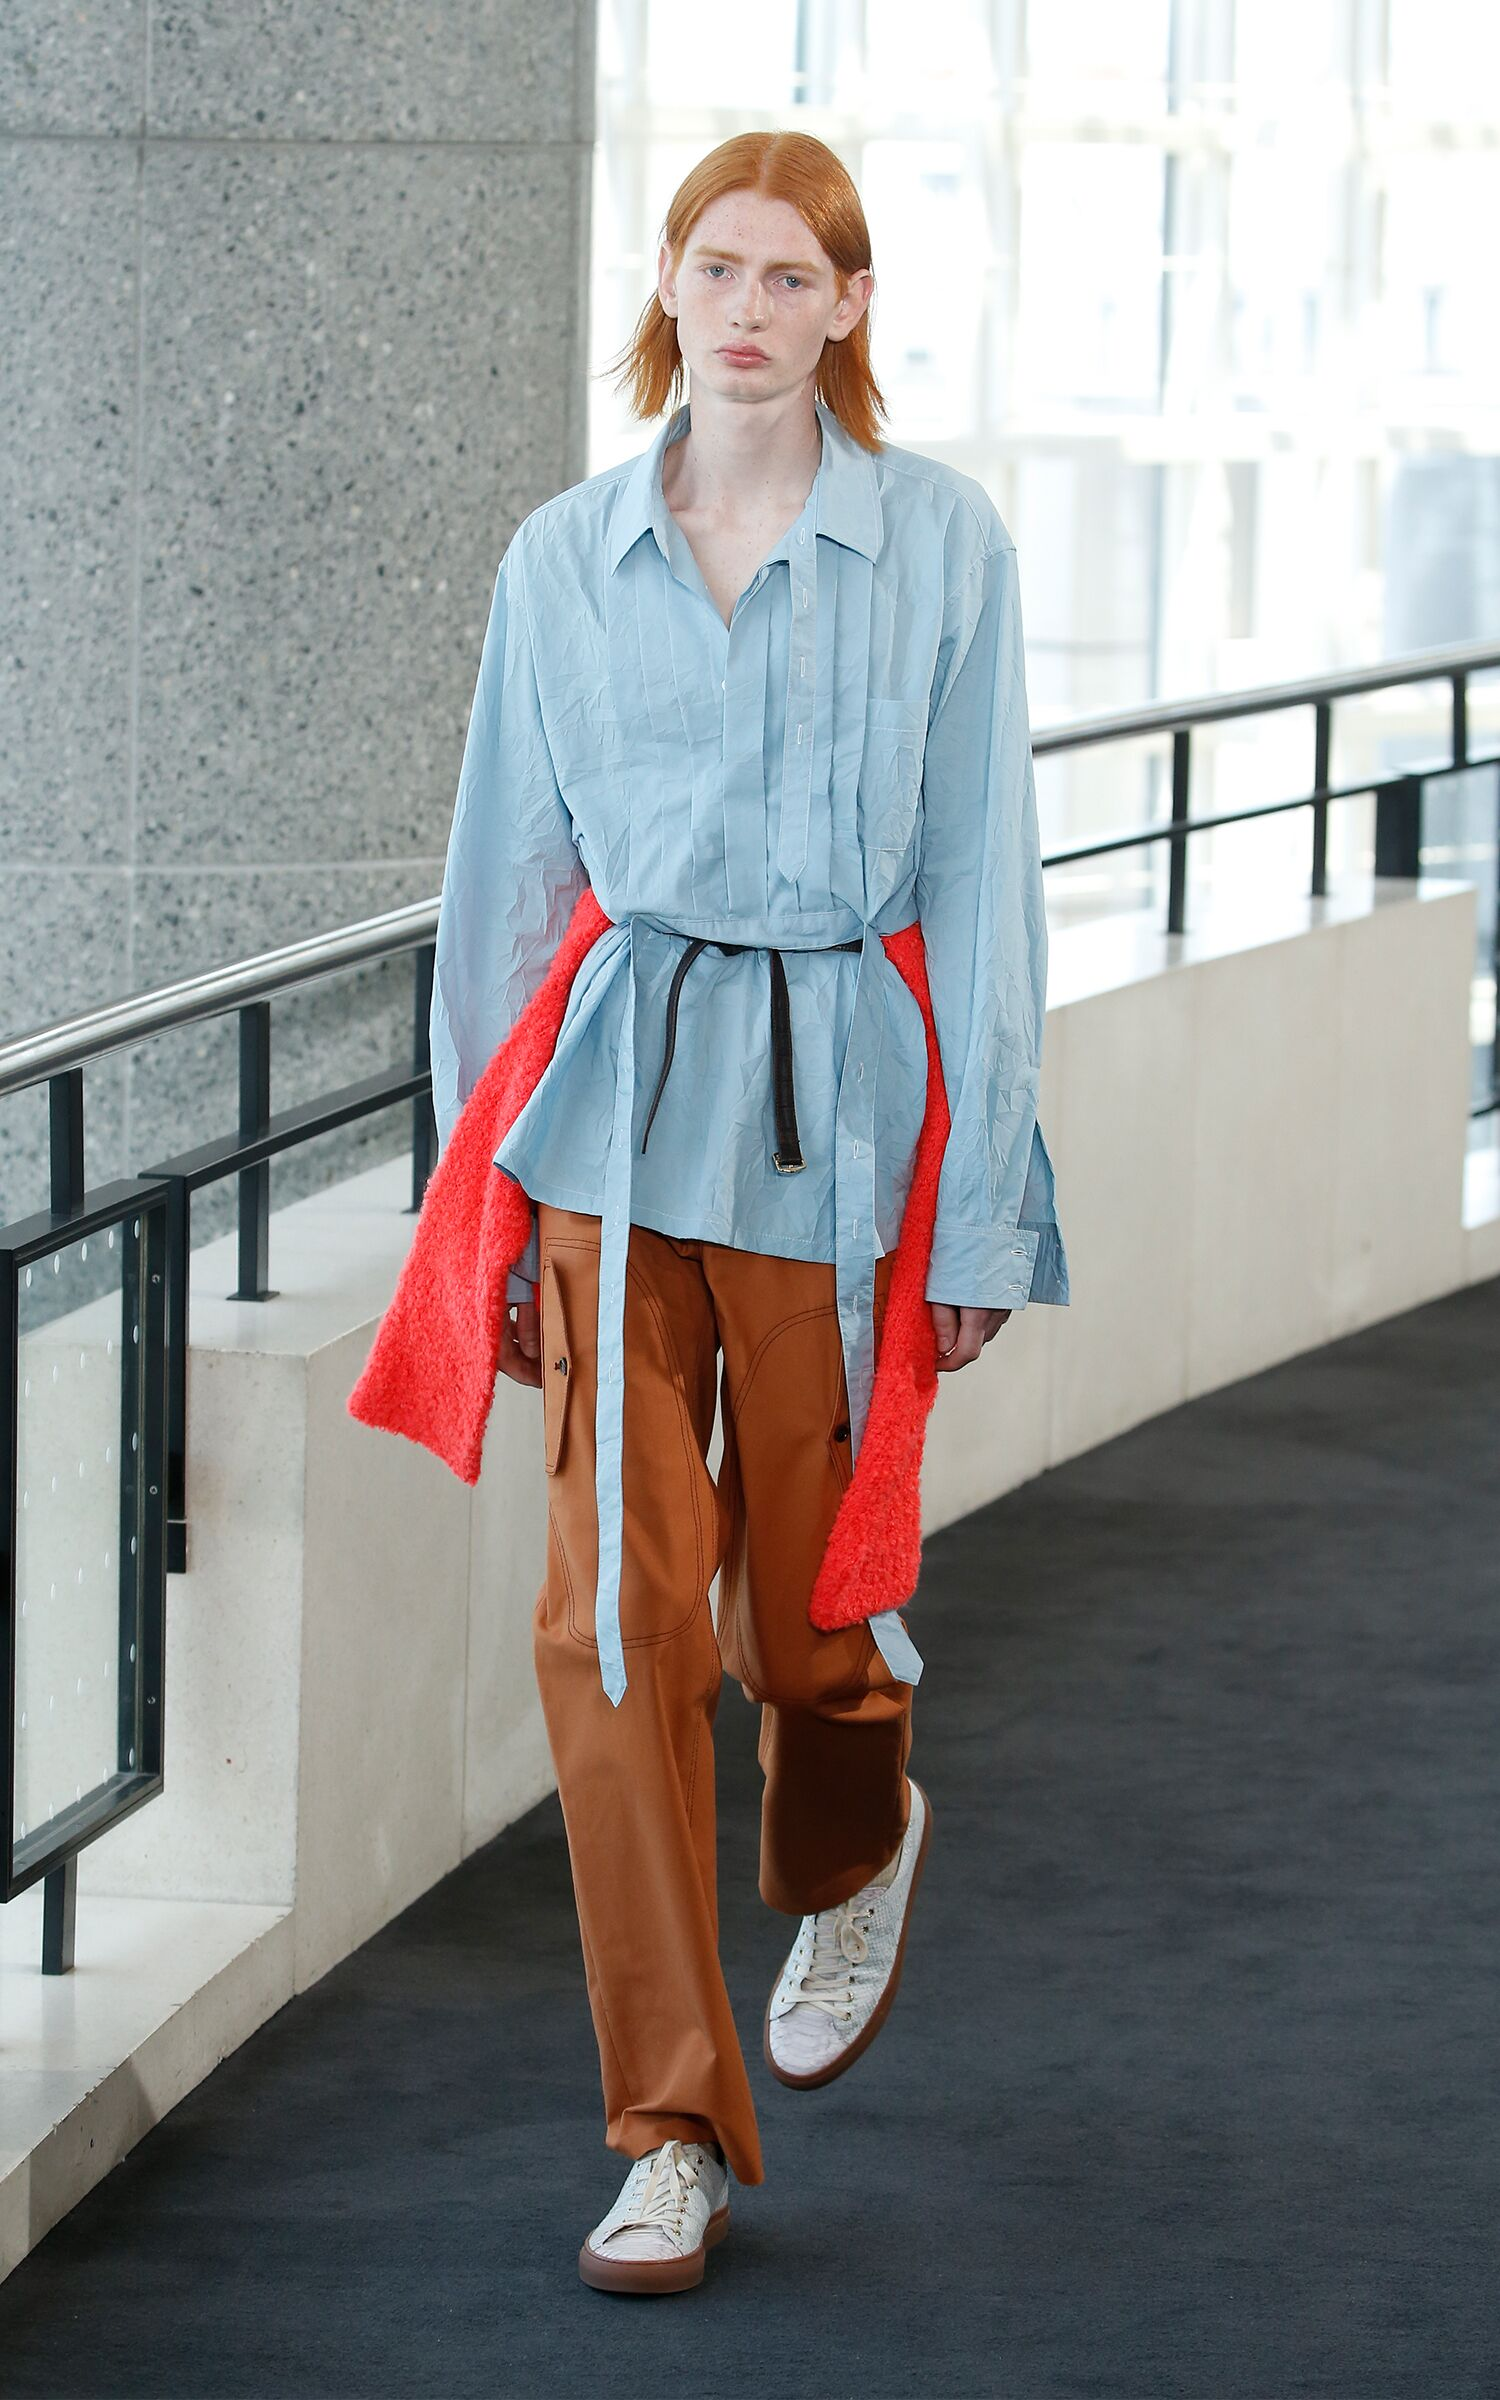 Sies Marjan SS 2020 Menswear